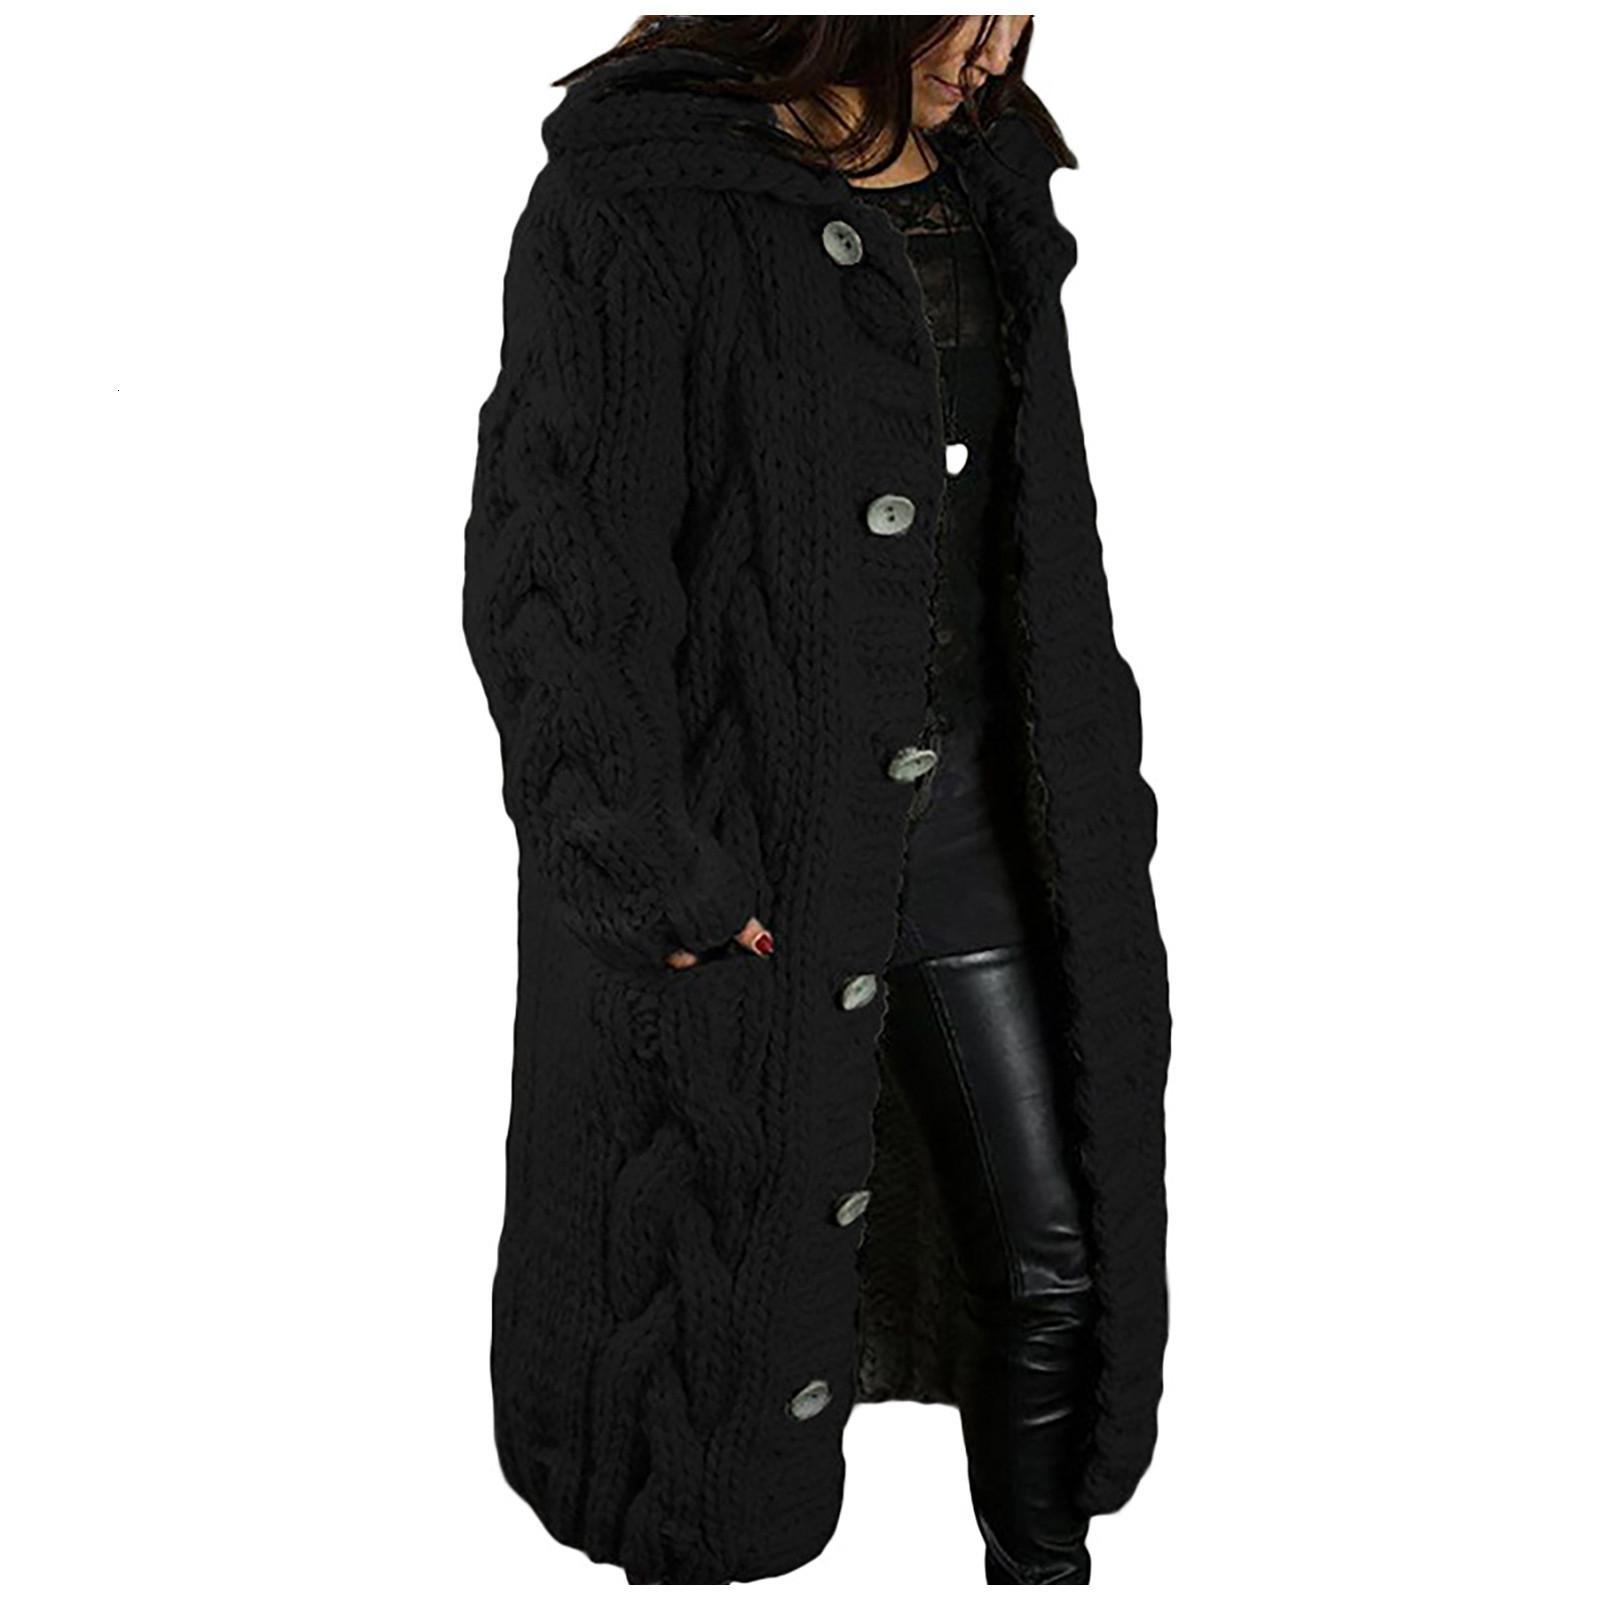 Coupe-vent femme cardigan cardigan de grande taille pull poche poche simple manches longues manches longues coupe-vent le 14 novembre